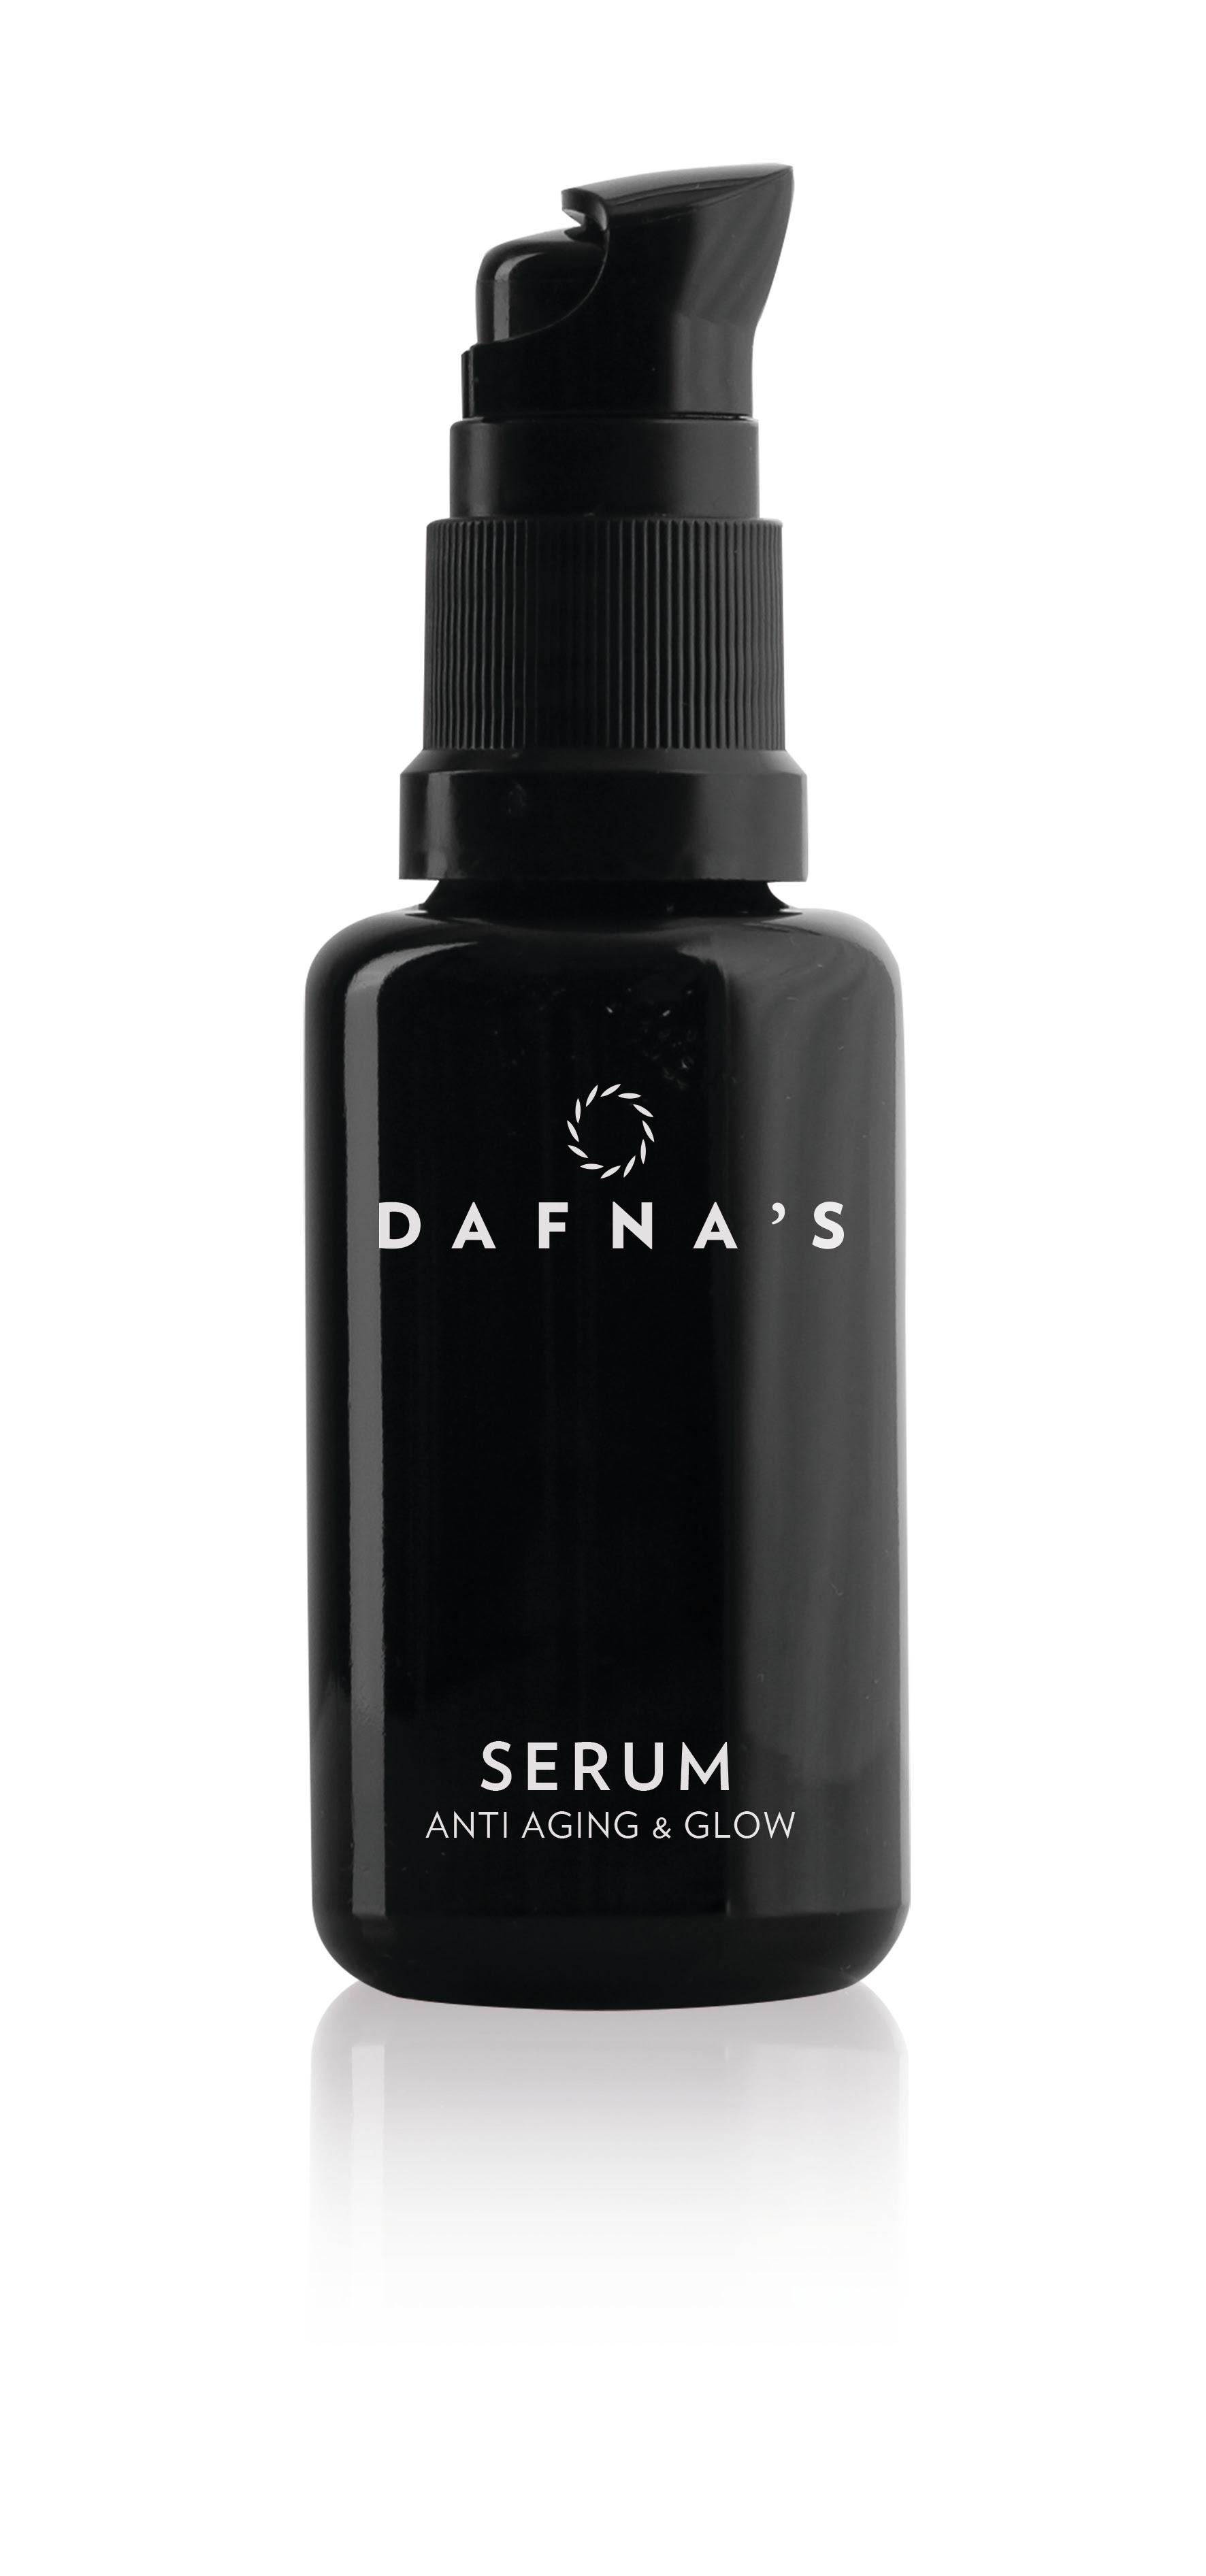 Dafnas serum